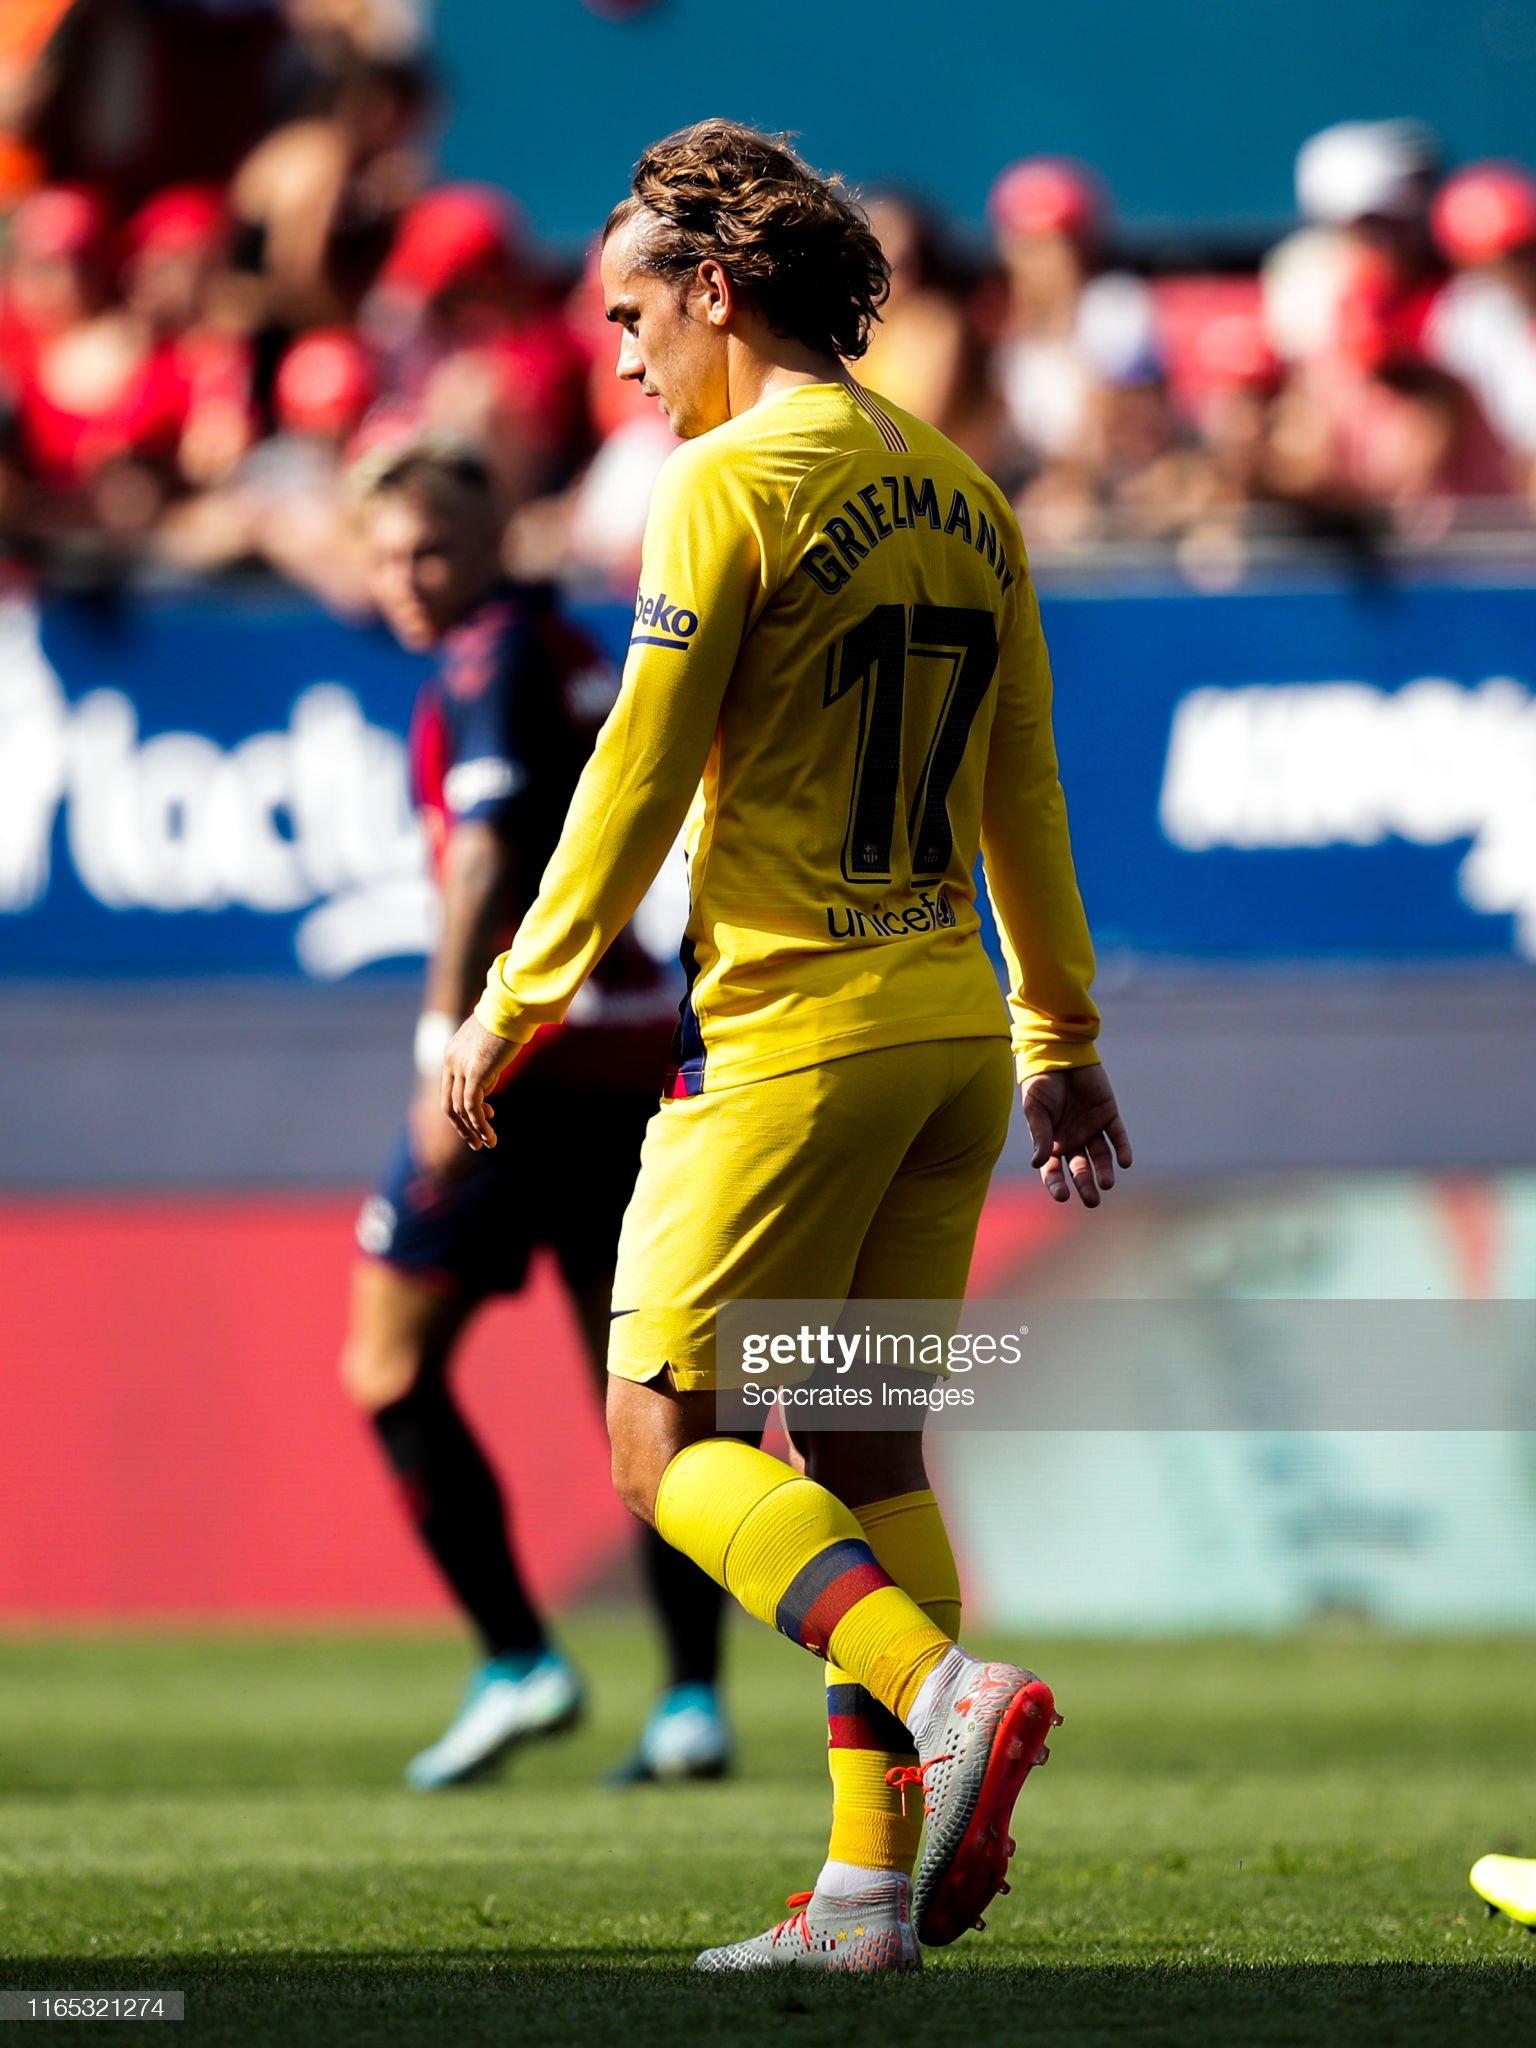 صور مباراة : أوساسونا - برشلونة 2-2 ( 31-08-2019 )  Antoine-griezmann-of-fc-barcelona-during-the-la-liga-santander-match-picture-id1165321274?s=2048x2048